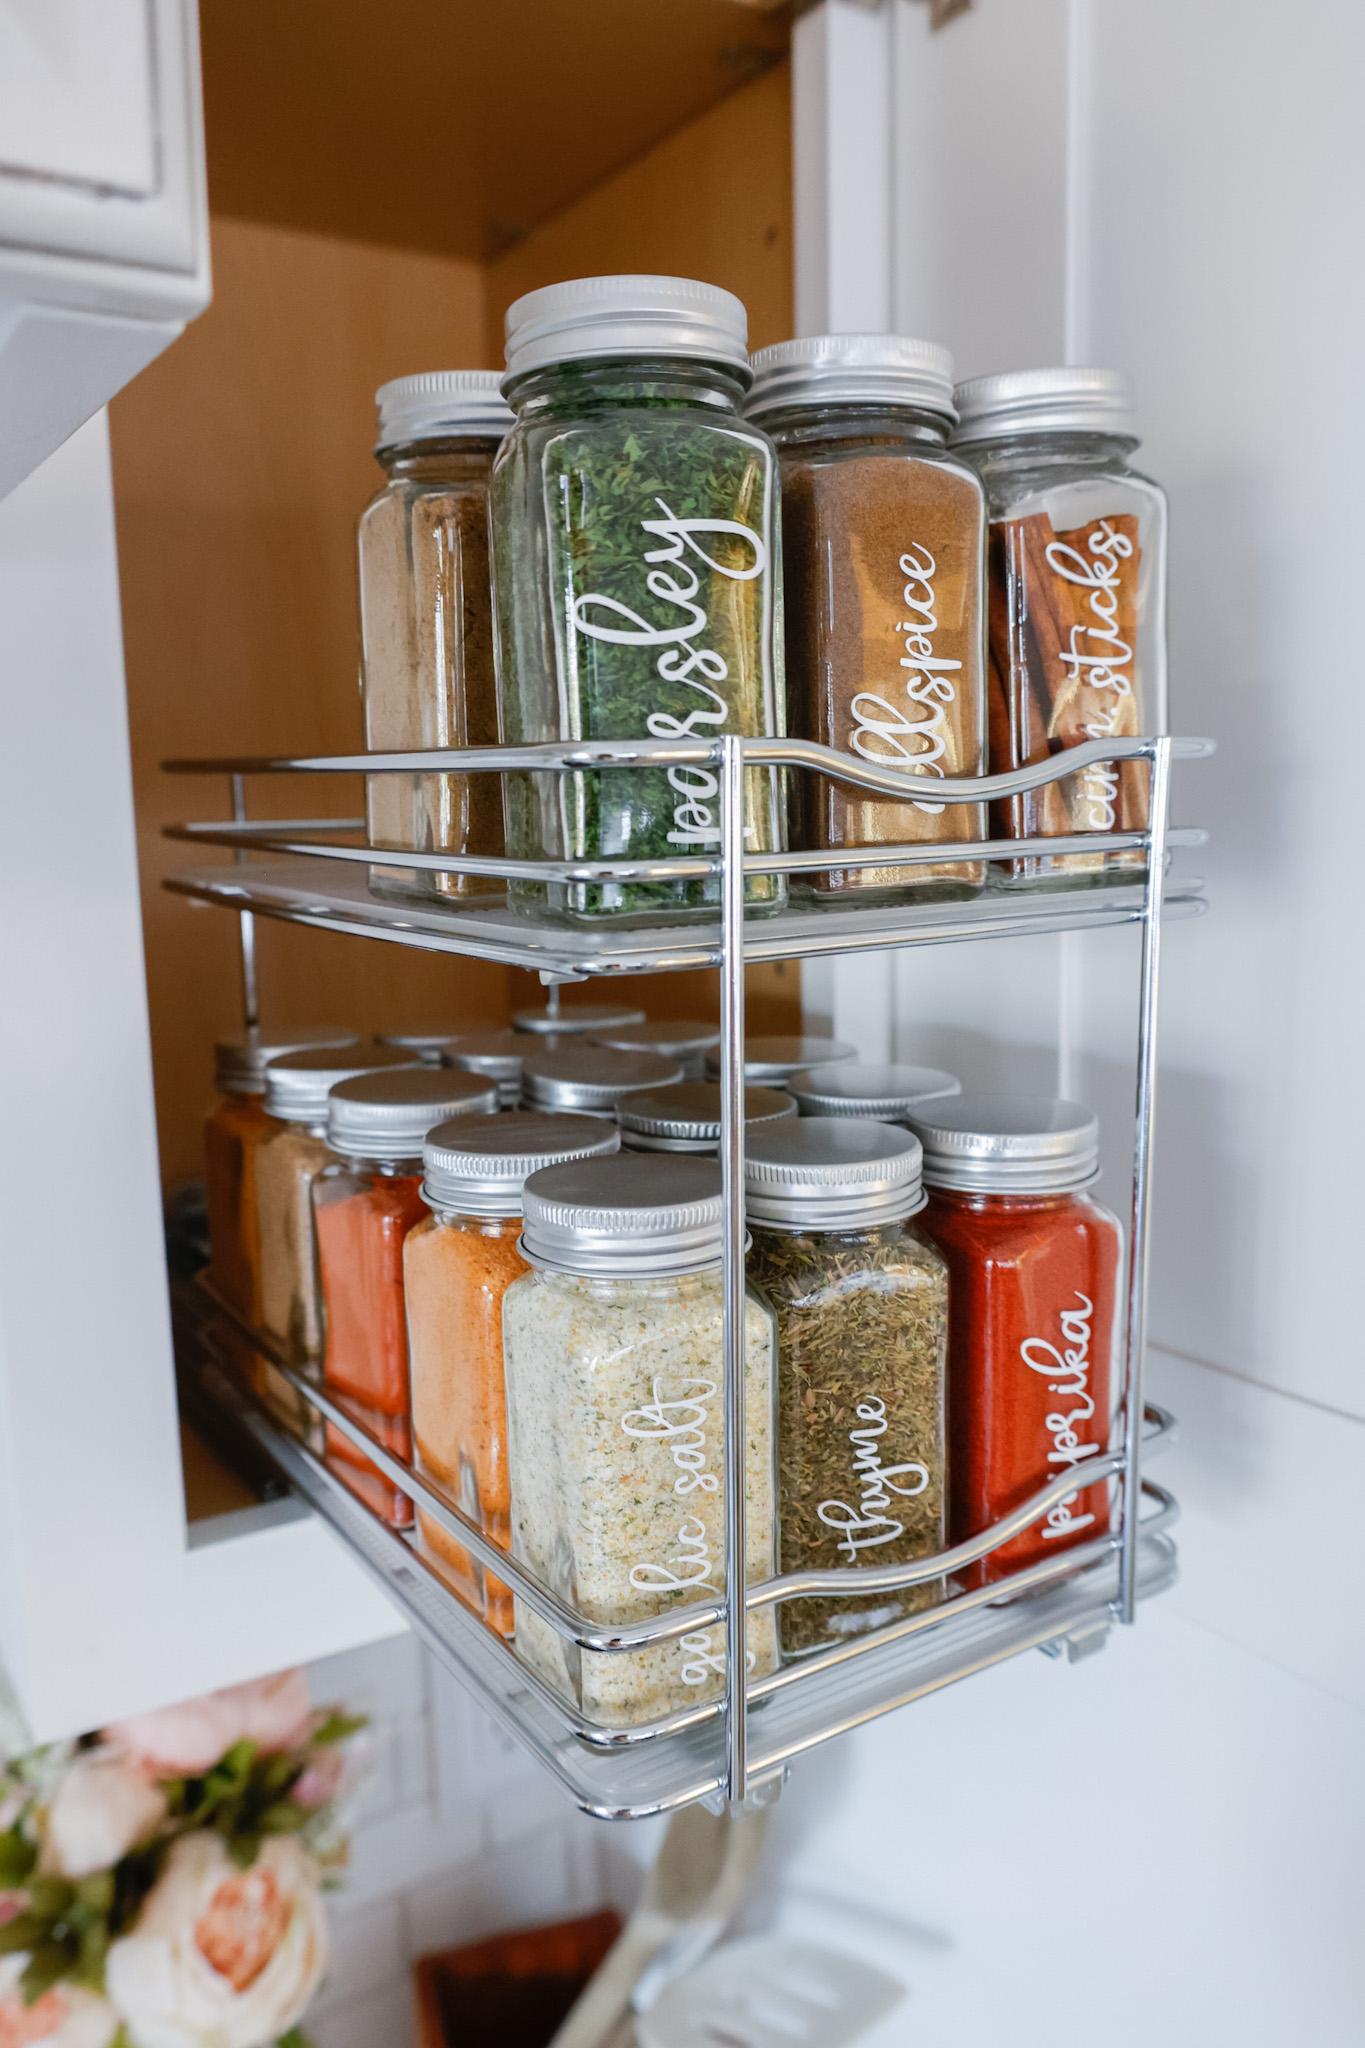 cabinet organization ideas for spice jars